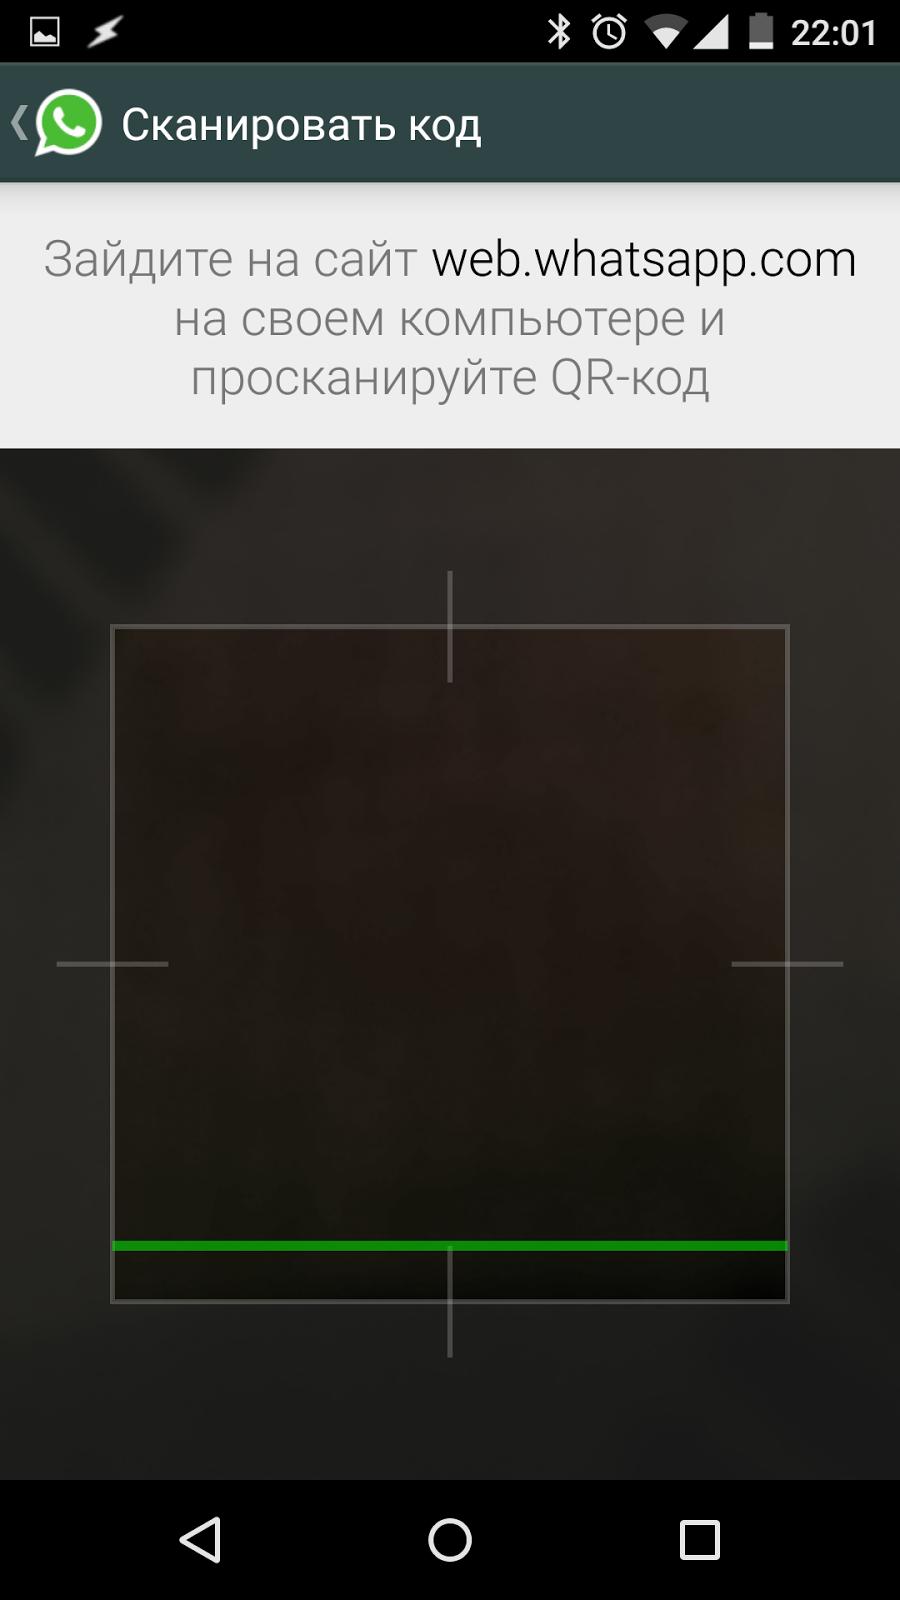 Screenshot_2015-02-20-22-01-45